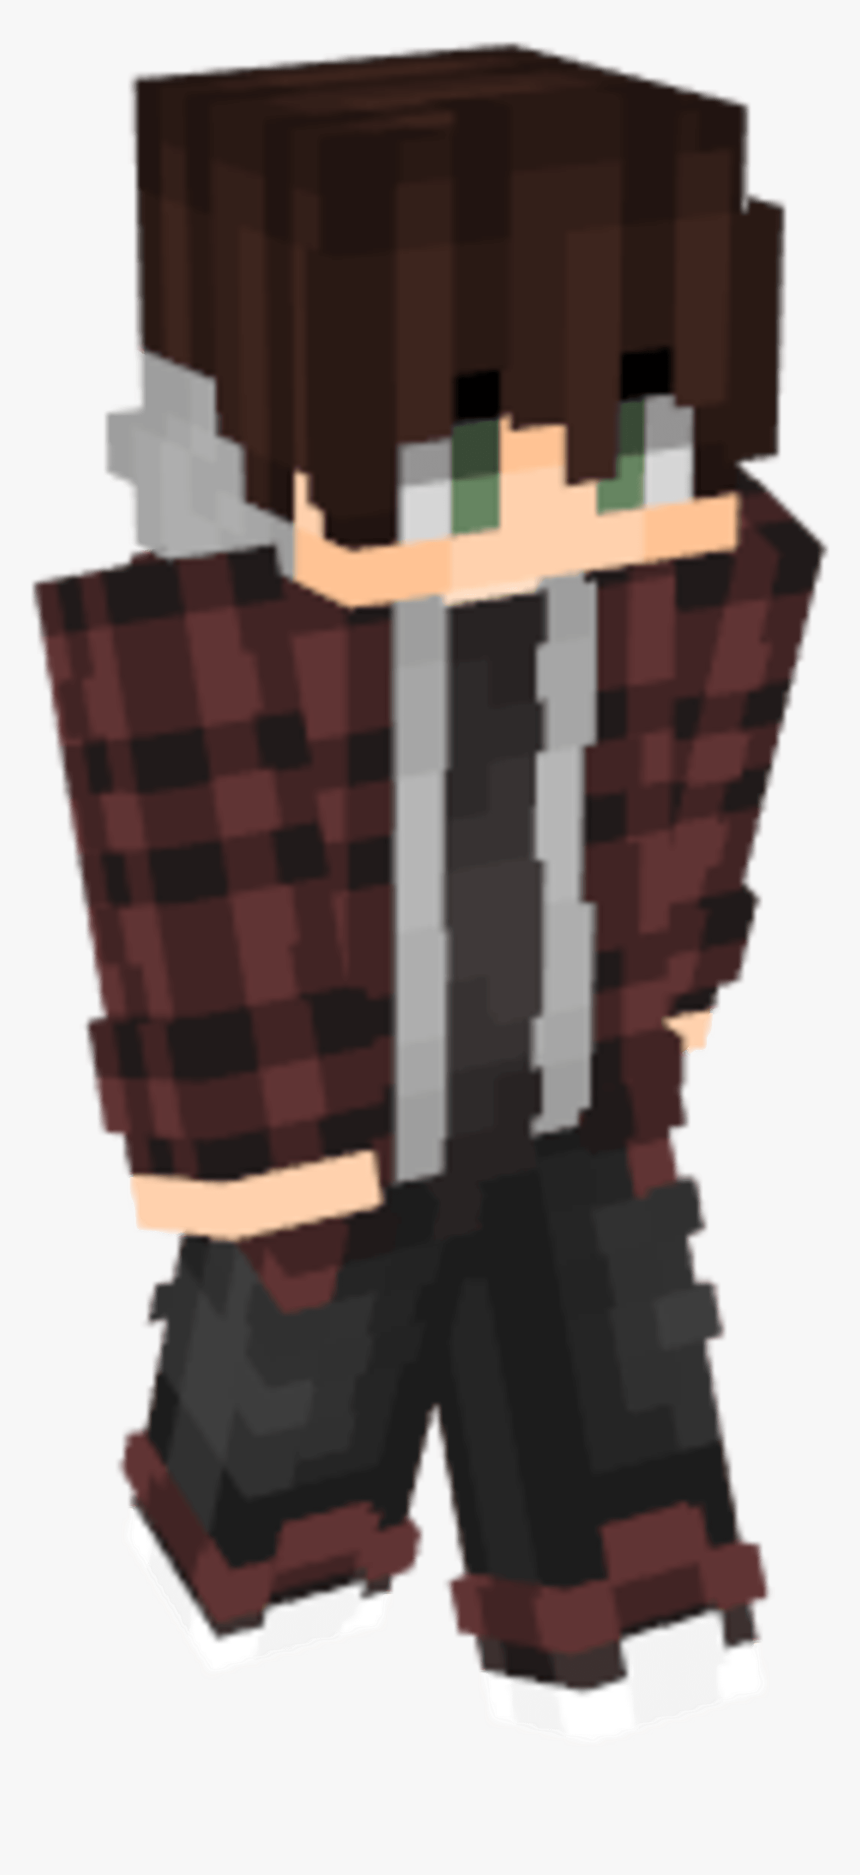 Best 8 Minecraft Skins Boy Hd Wallpapers - Skin Minecraft Pe Cute